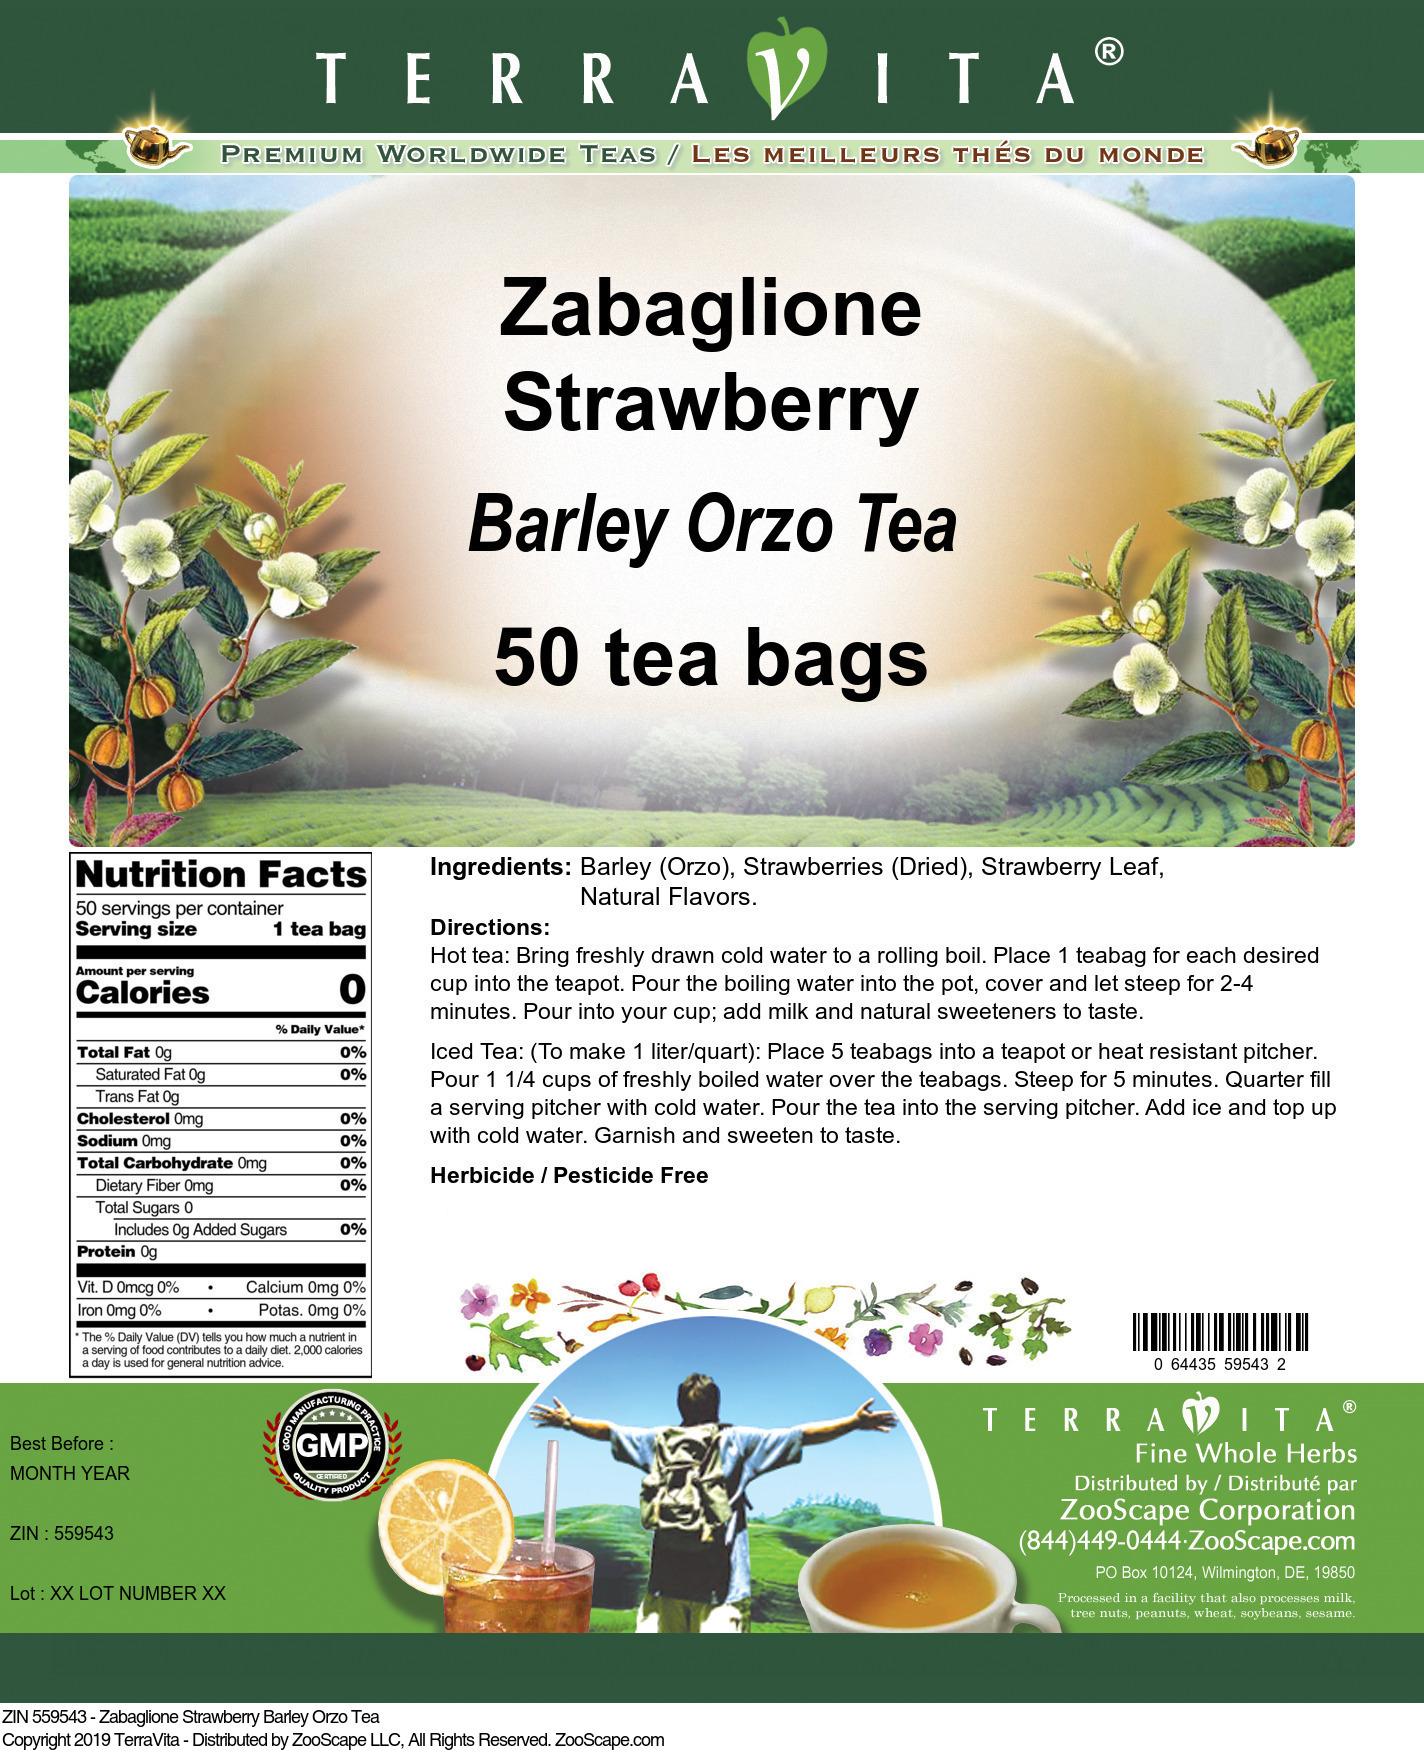 Zabaglione Strawberry Barley Orzo Tea